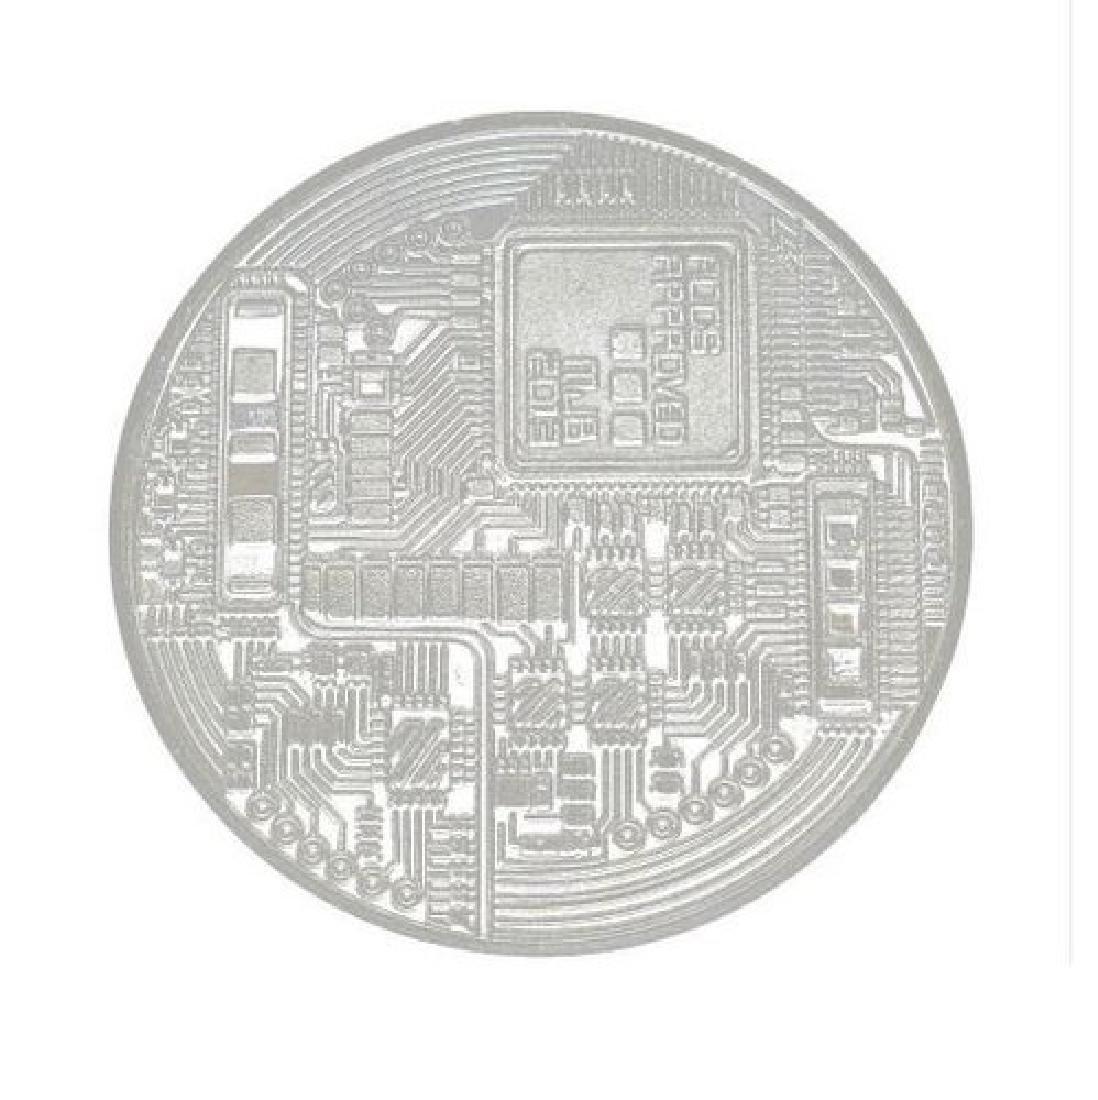 1 PCS Gold Plated Bitcoin Litecoin Ethereum Coins - 3